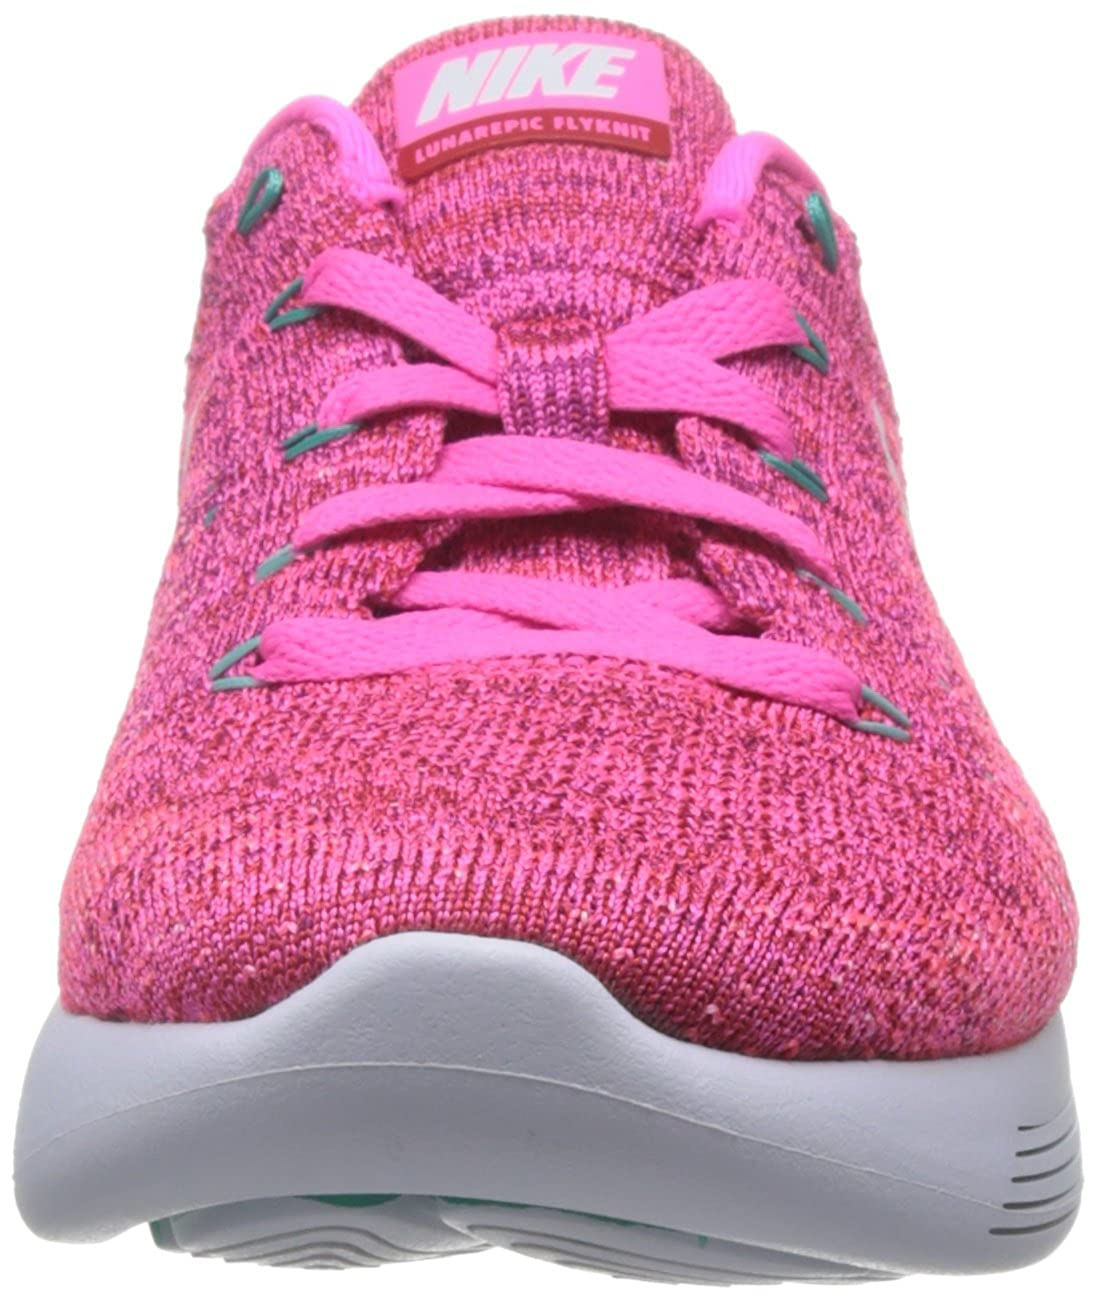 Nike 843765-601, Chaussures de Trail Femme, Rose (Pink Blast/White-Clear Jade-Hyper Turq), 40 EU